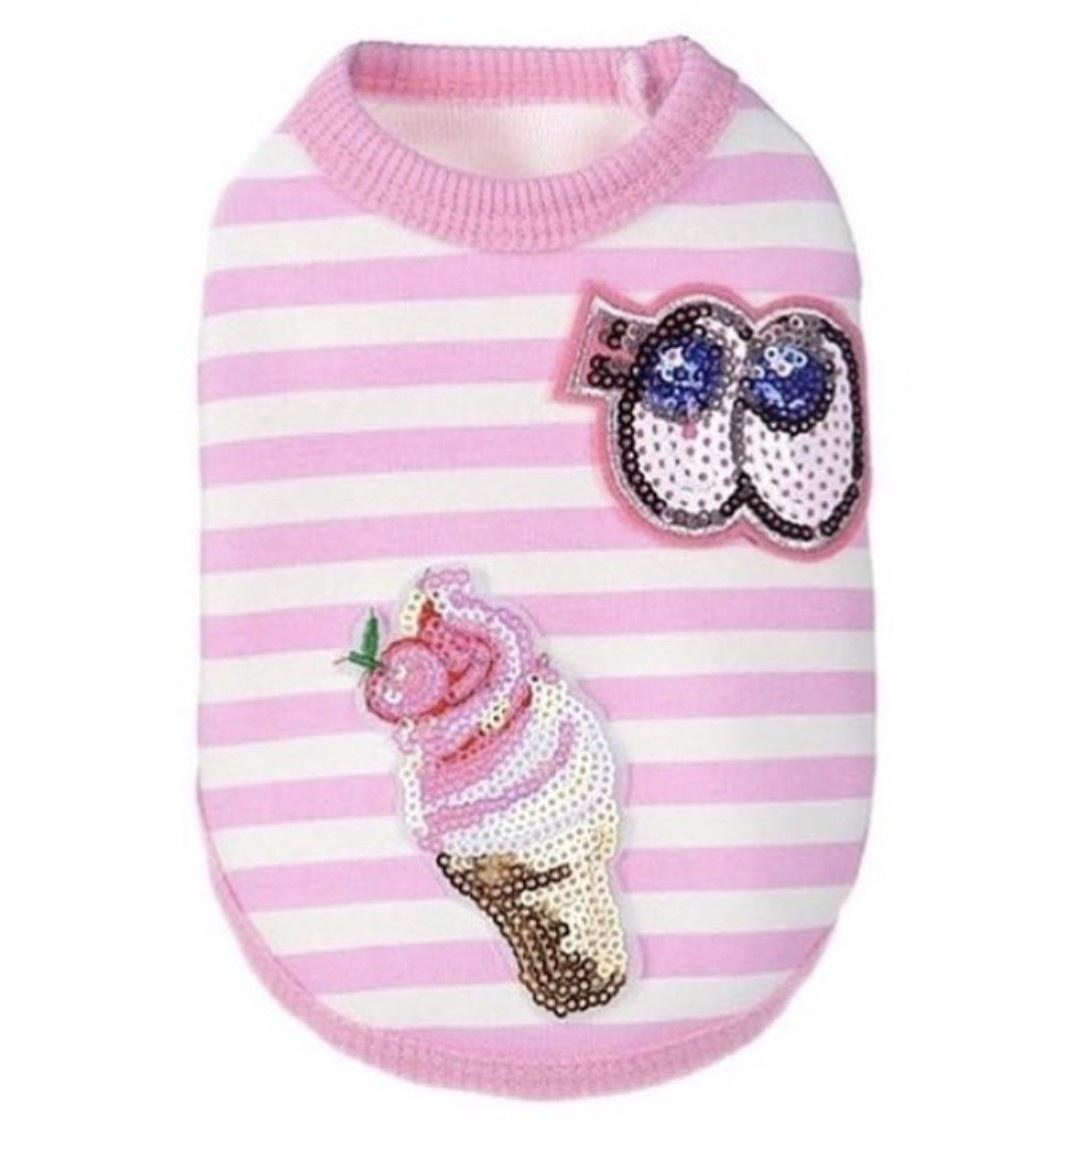 Одежда для собак Arnydog.ru Майка Айскрим ARN002_10#, розовый